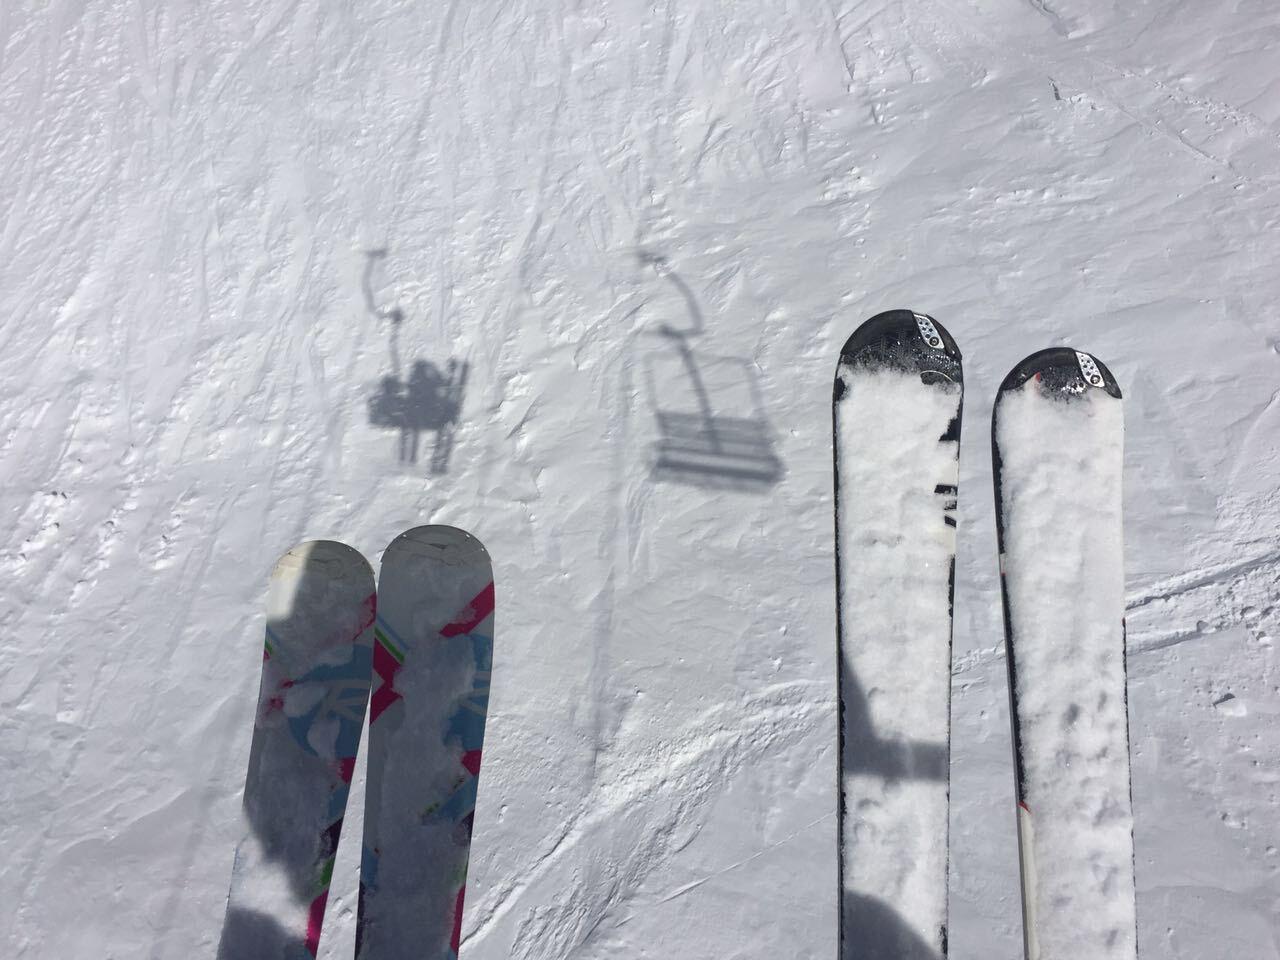 Teleférico do Valle Nevado Ski Resort